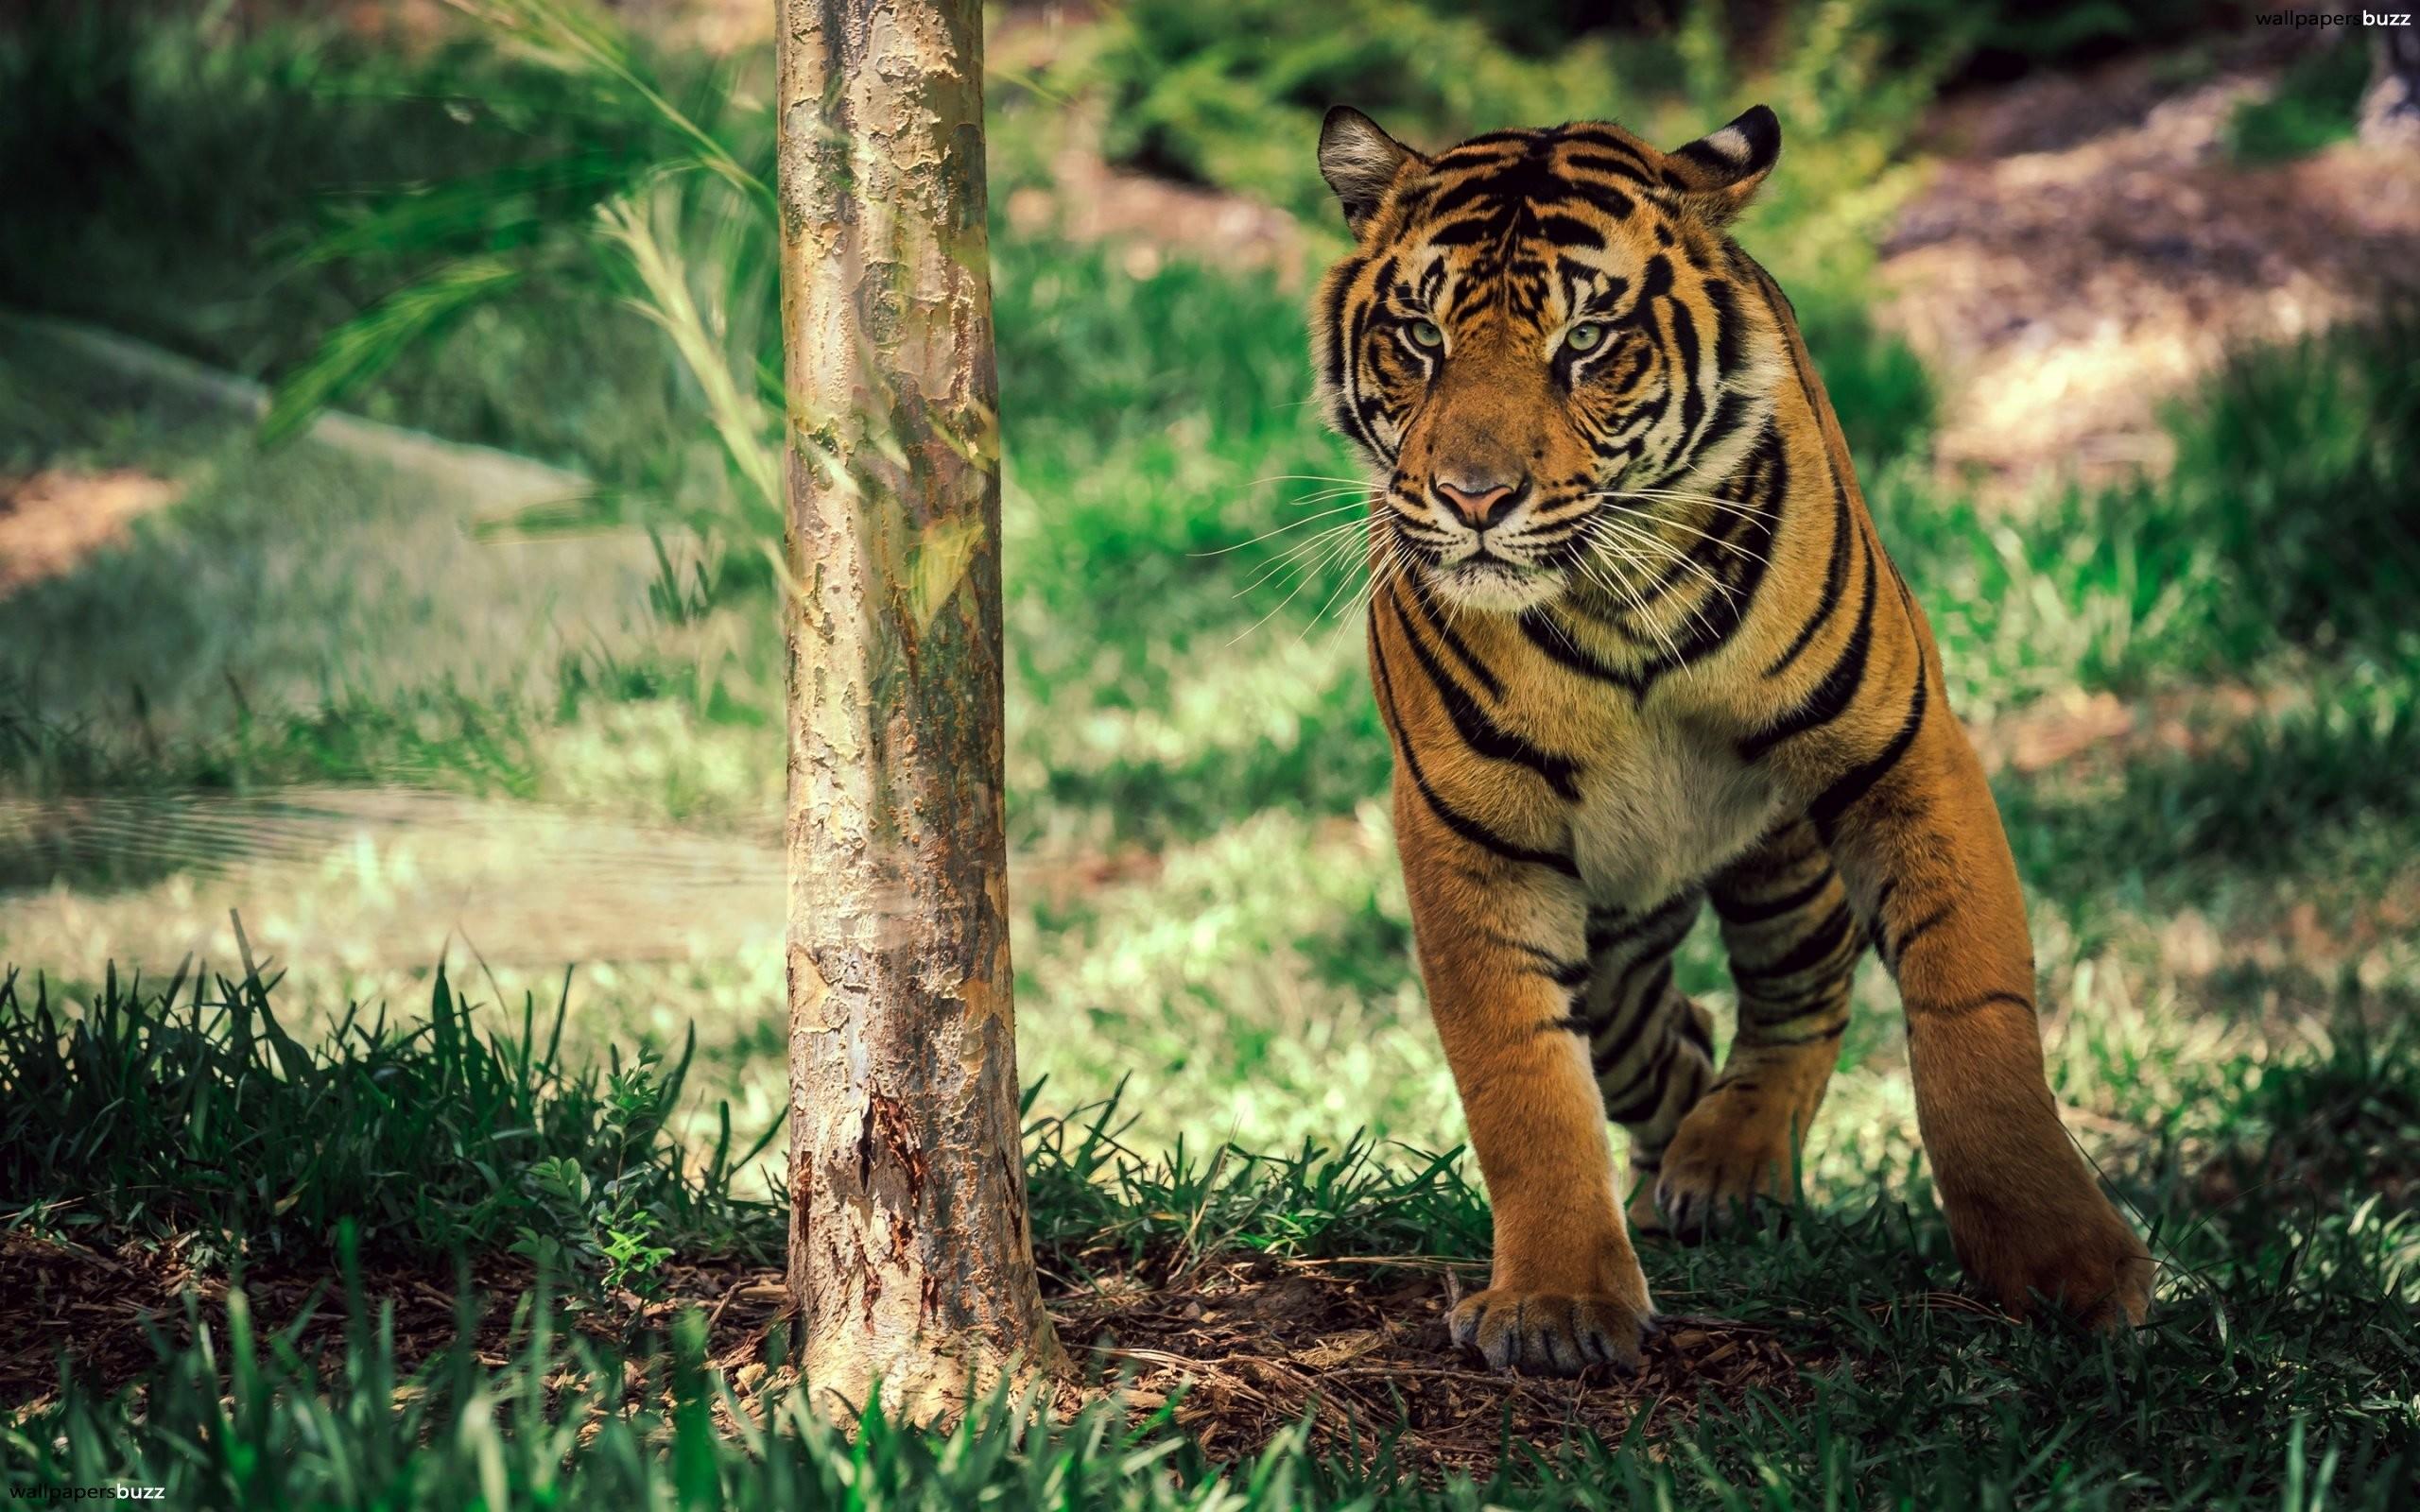 Tiger Resting 4k Hd Desktop Wallpaper For 4k Ultra Hd Tv: Cute Baby Tiger Wallpaper (68+ Images